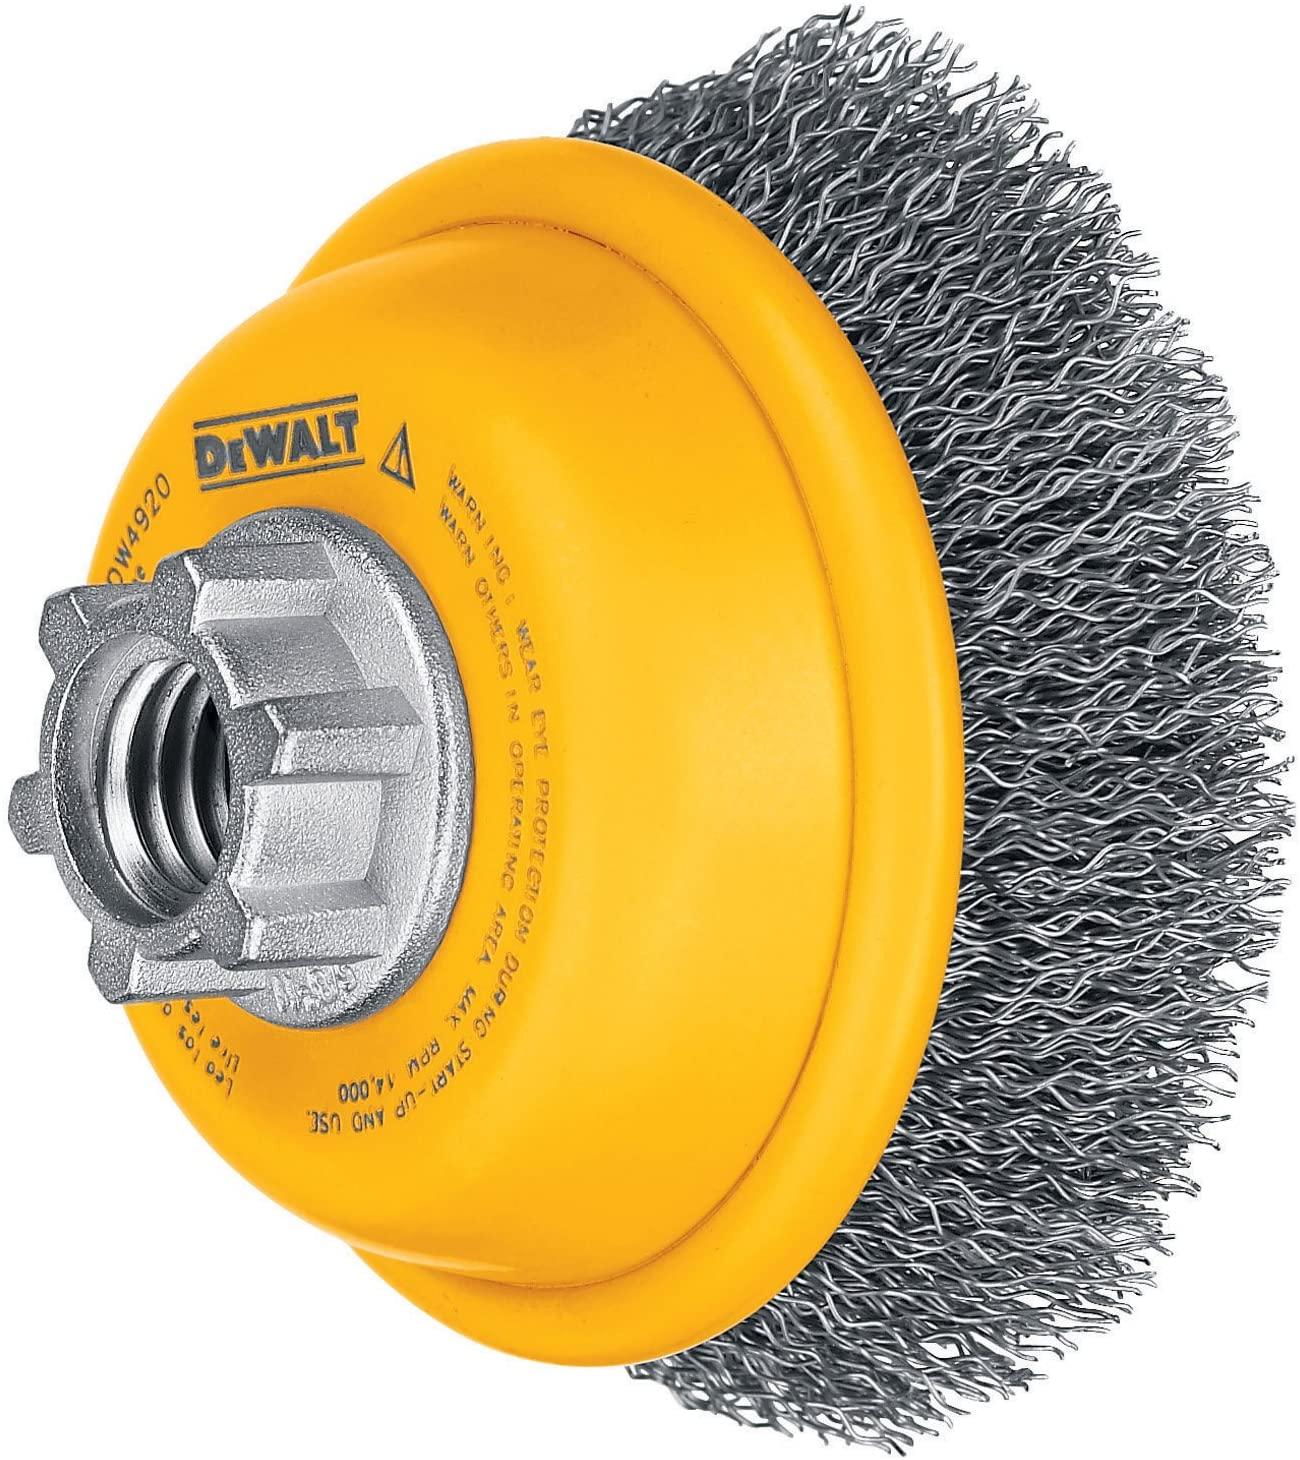 Amazon.com: DEWALT Wire Cup Brush, Crimped, 3-Inch (DW4920) : $5.42